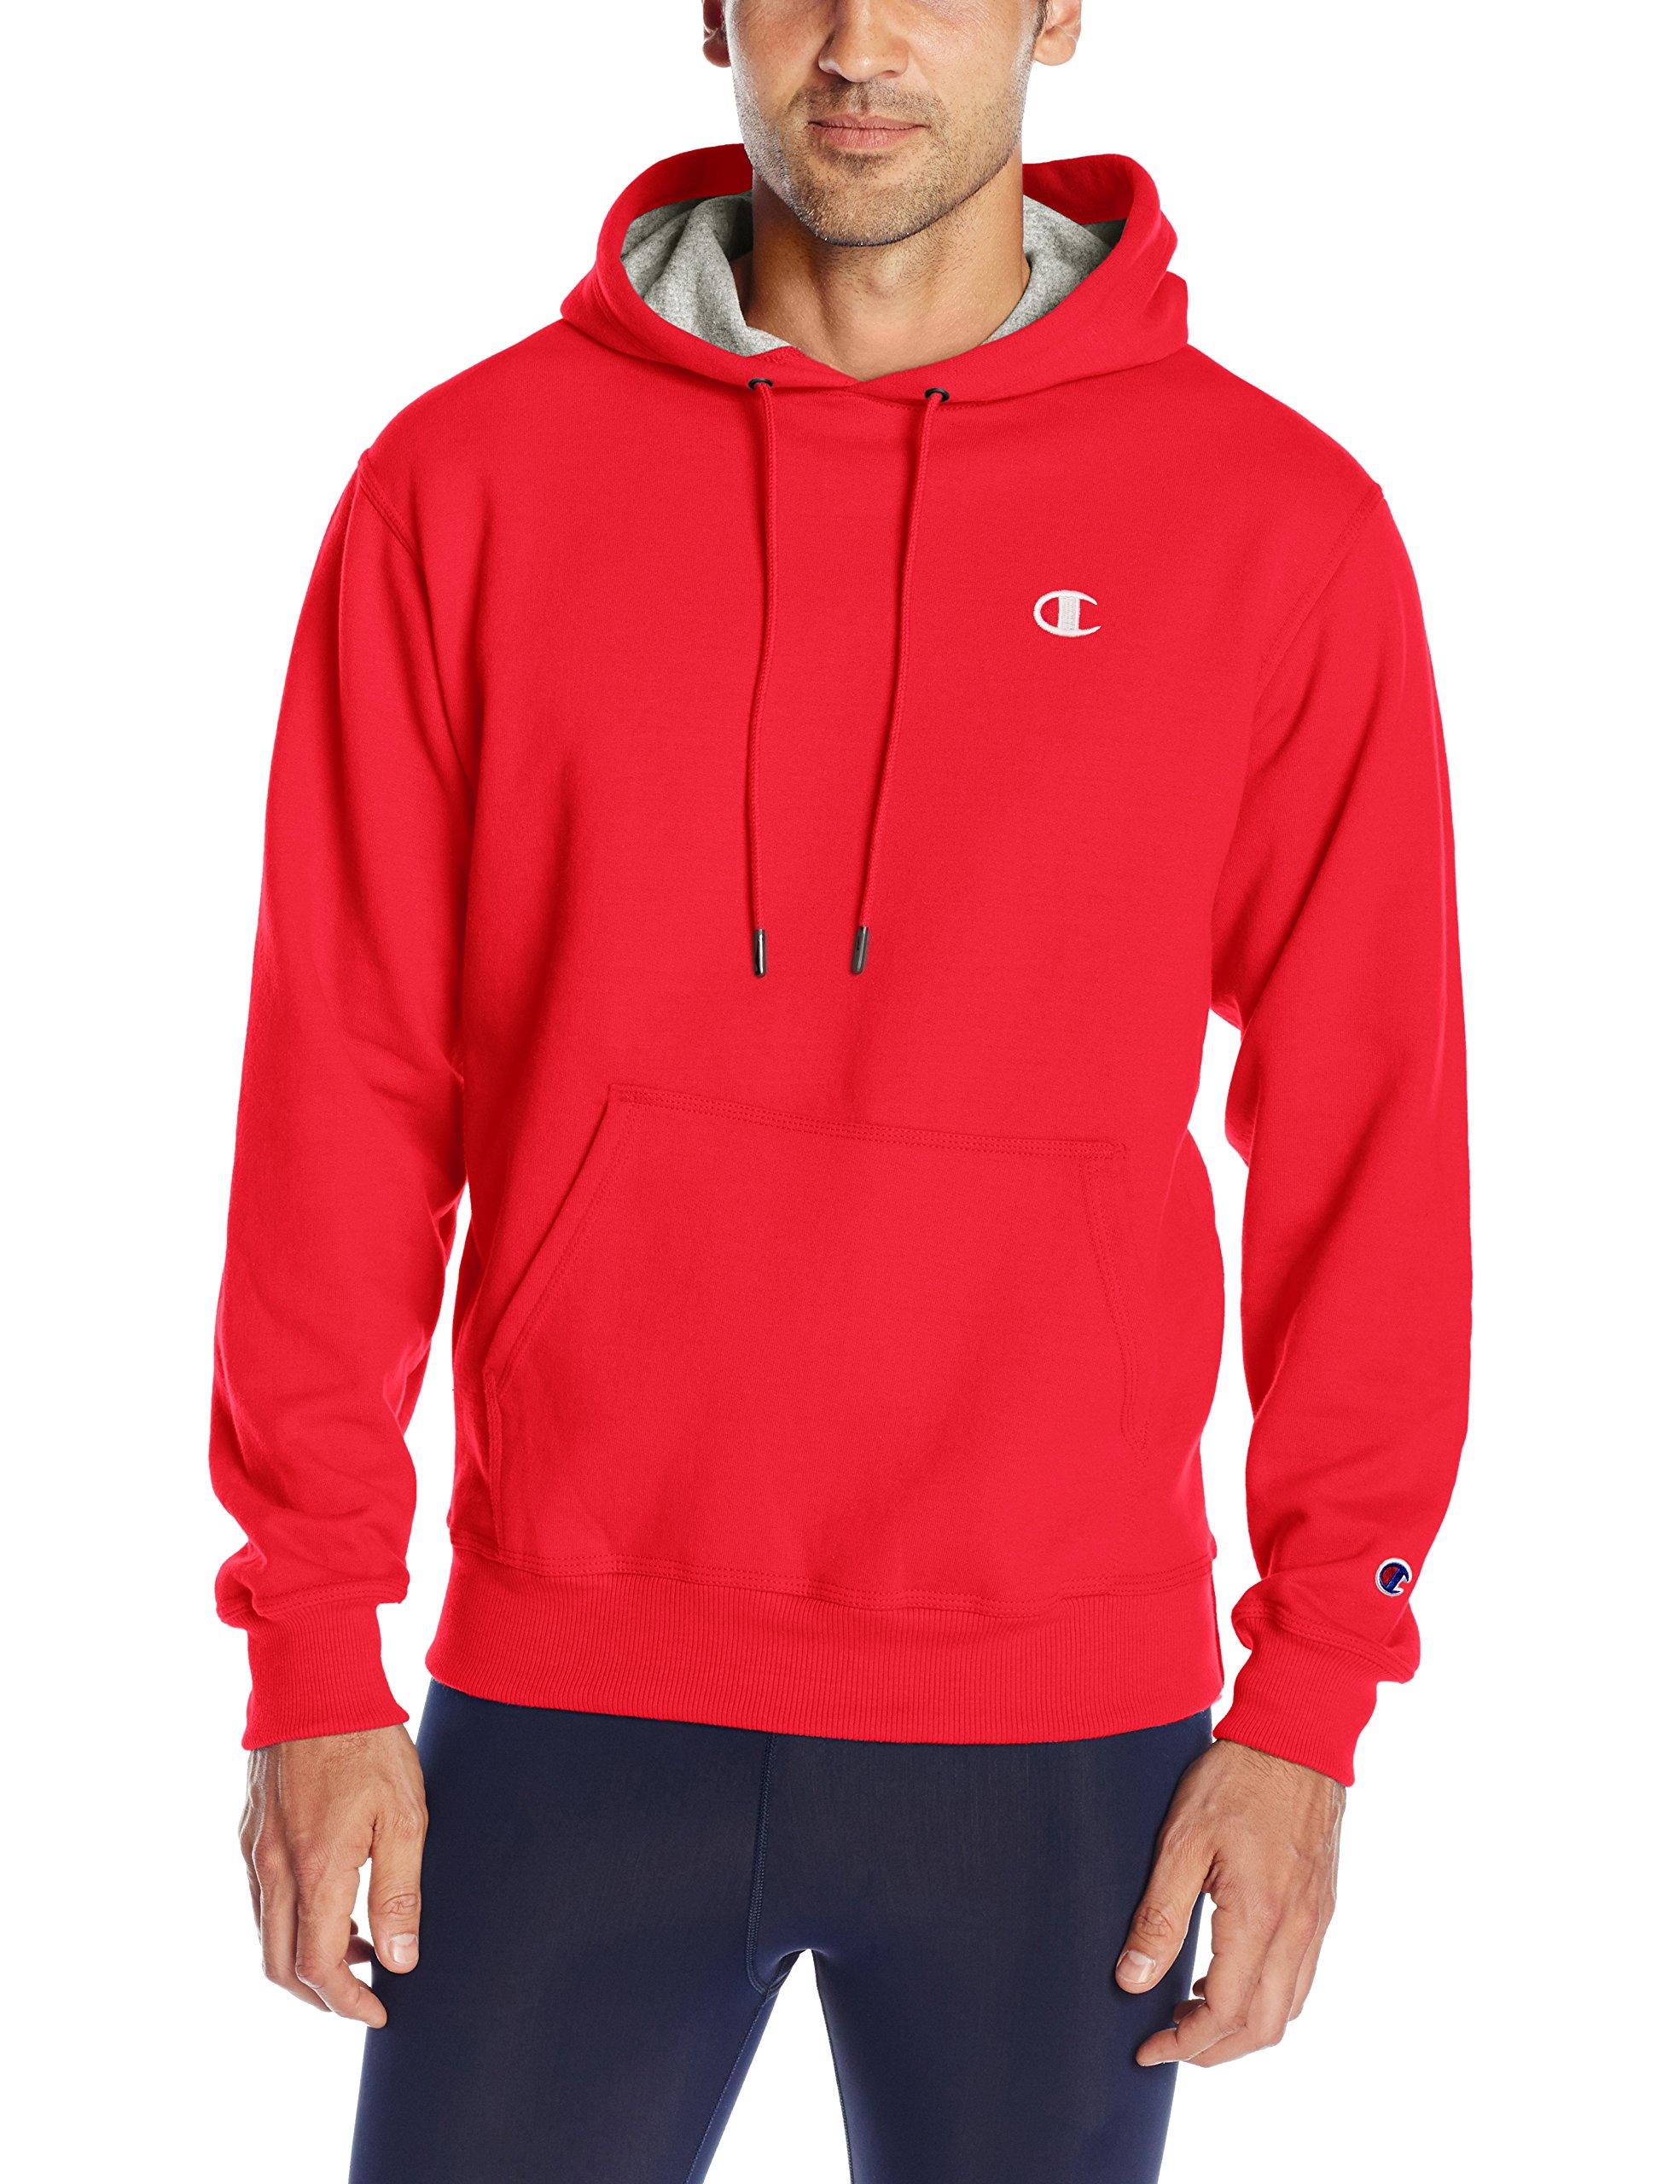 Champion Men's Powerblend Pullover Hoodie, Team red Scarlet/White Embroidered c Logo, Medium